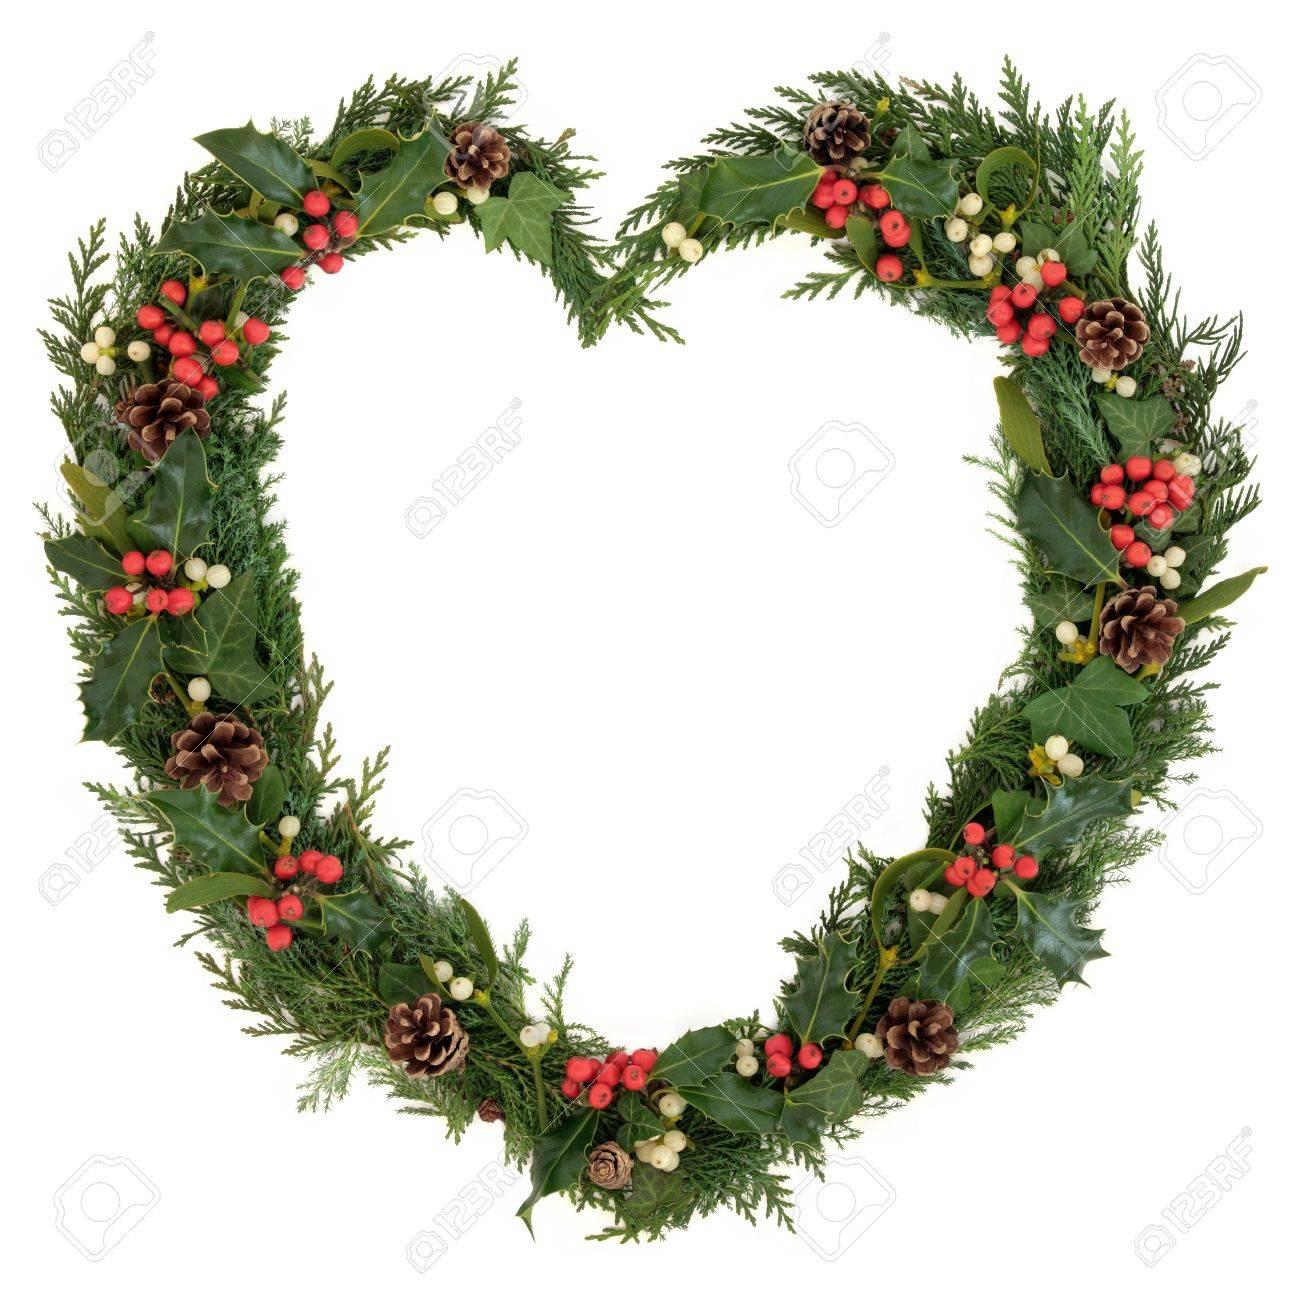 Christmas Heart Wreath.Christmas Heart Wreath With Holly Mistletoe Ivy Pine Cones